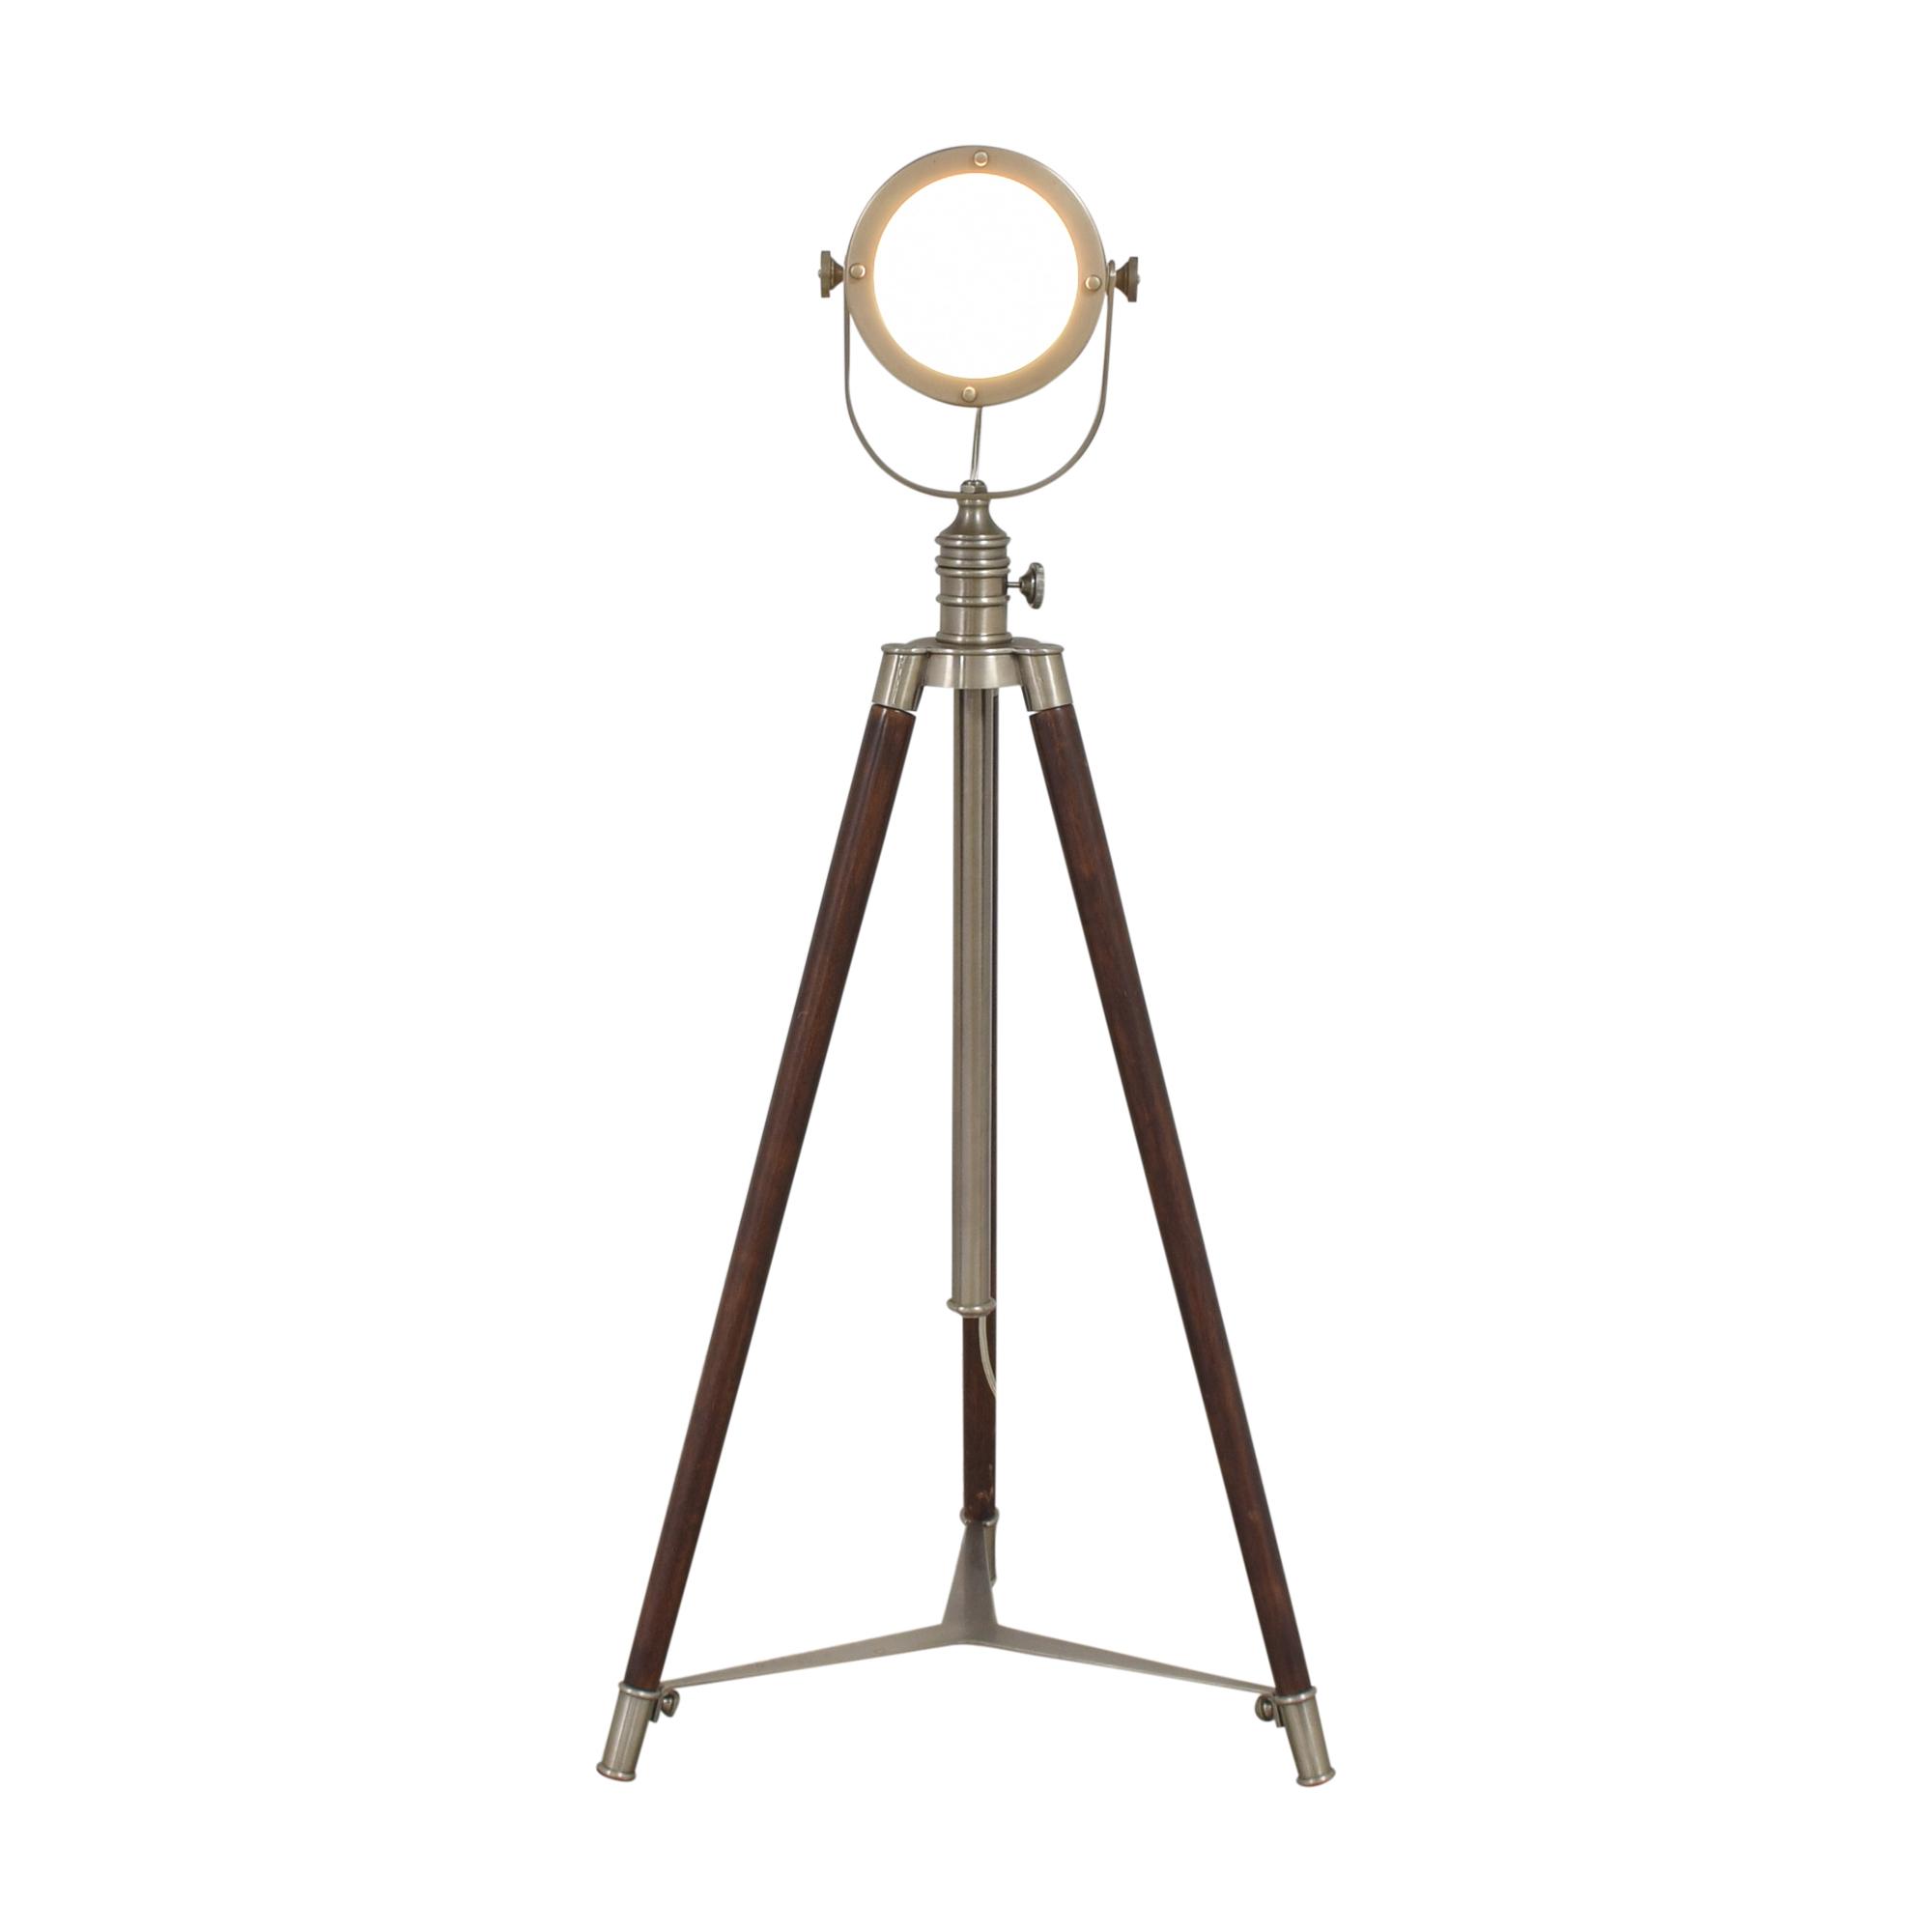 buy Pottery Barn Photographer's Adjustable Tripod Floor Lamp Pottery Barn Lamps